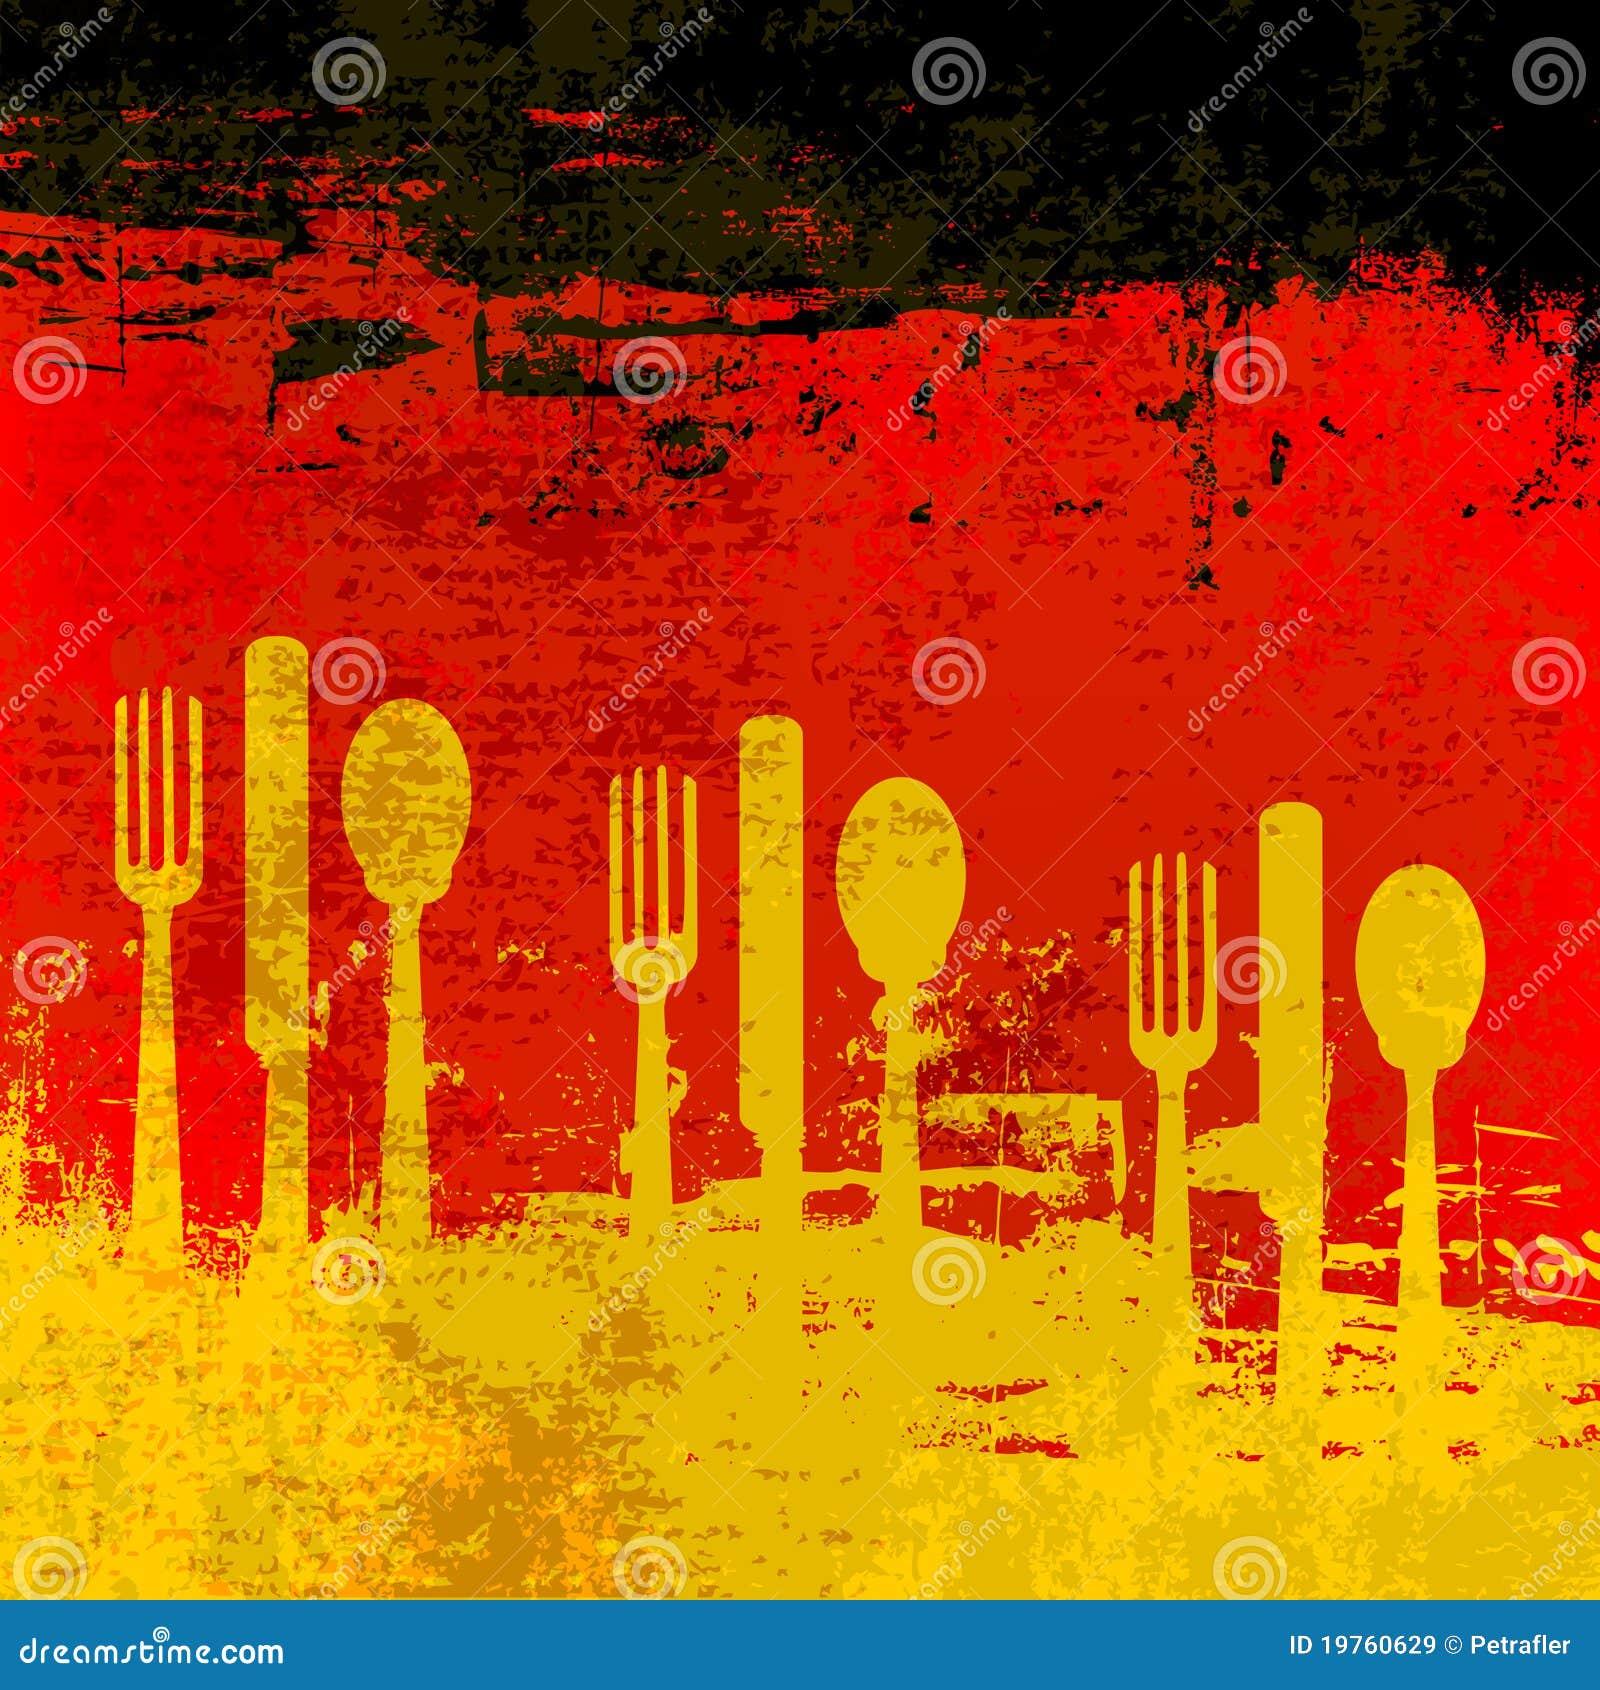 German Menu Template Royalty Free Stock Images - Image ...